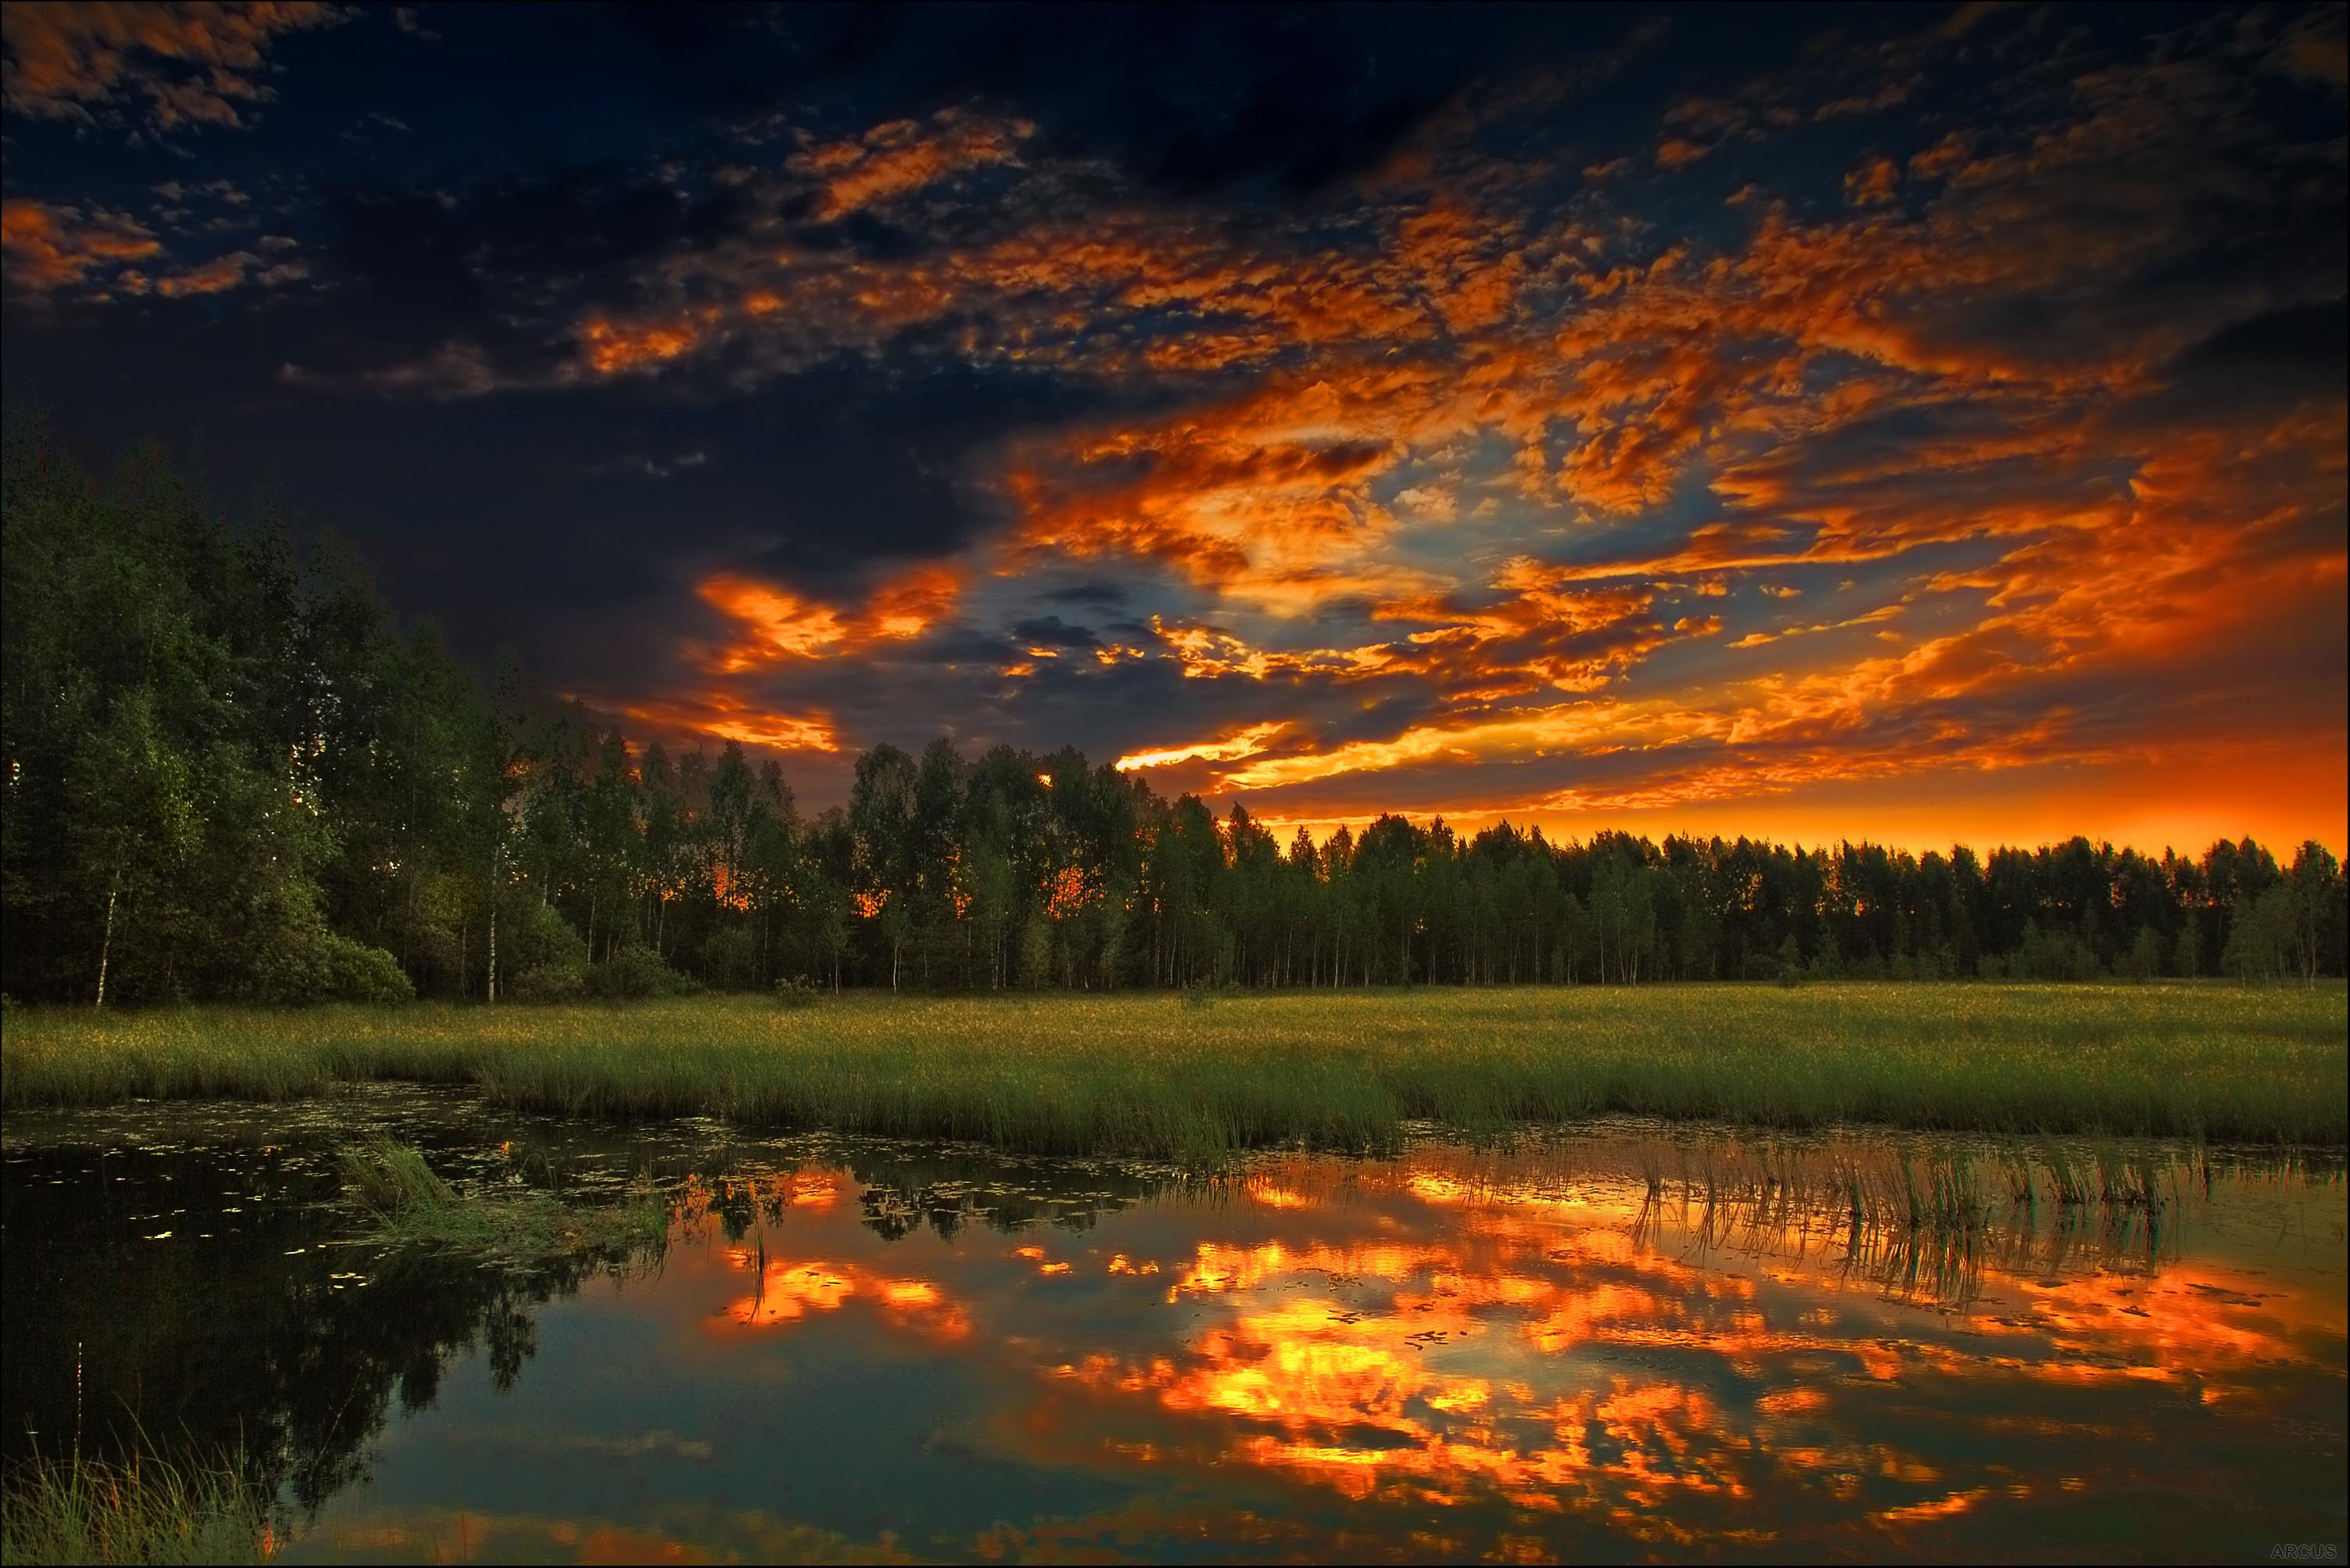 Fotografie - Scenic  Achtergrond